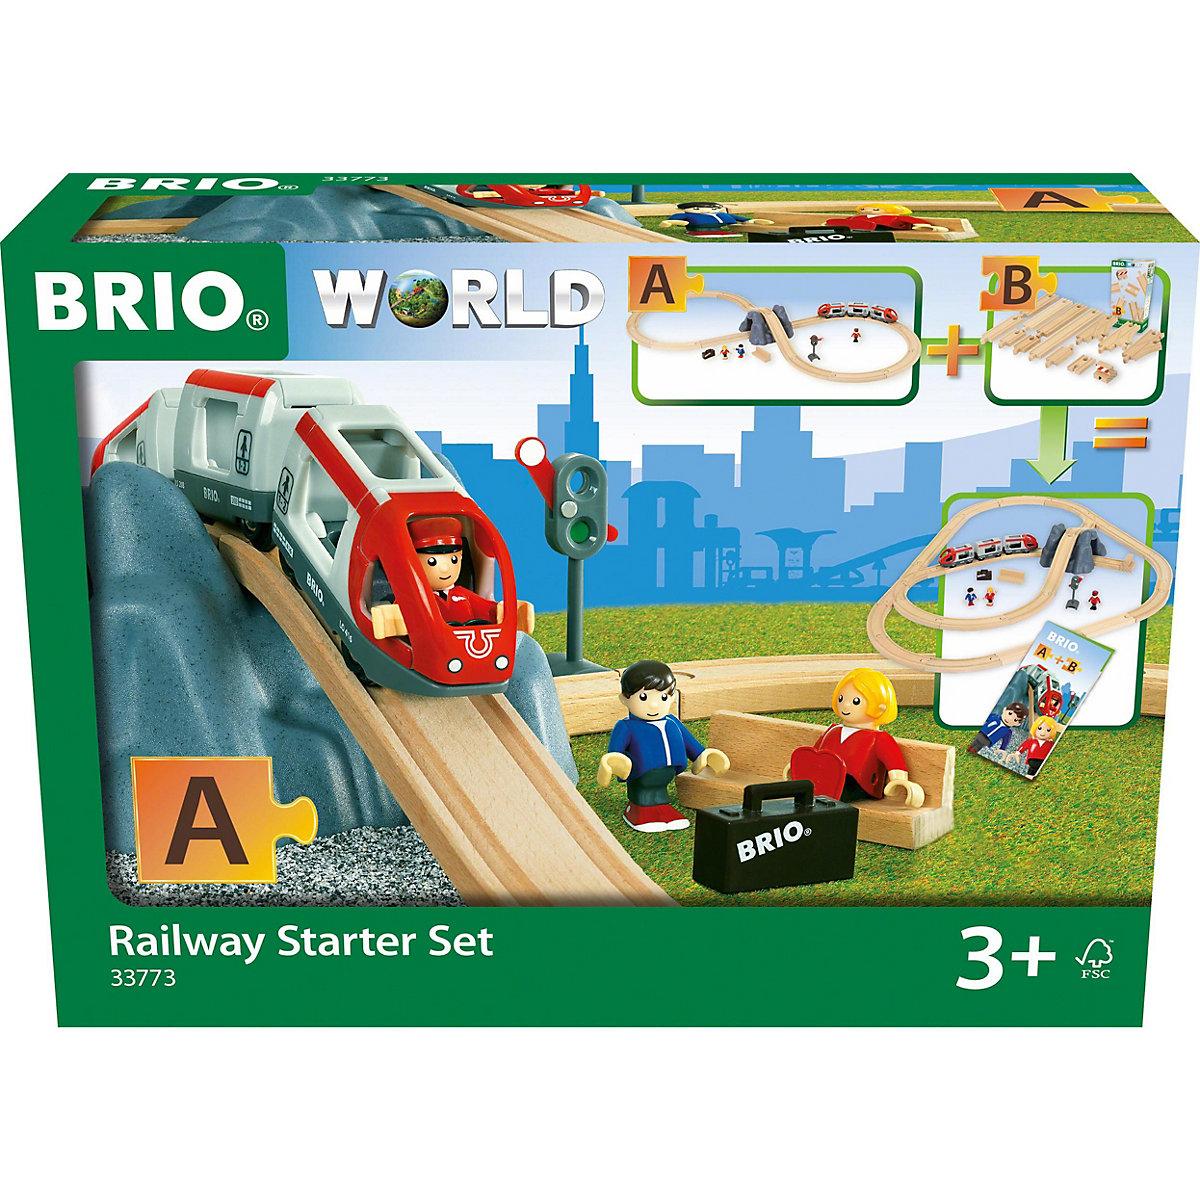 Eisenbahn Starter Set : eisenbahn starter set a brio mytoys ~ A.2002-acura-tl-radio.info Haus und Dekorationen